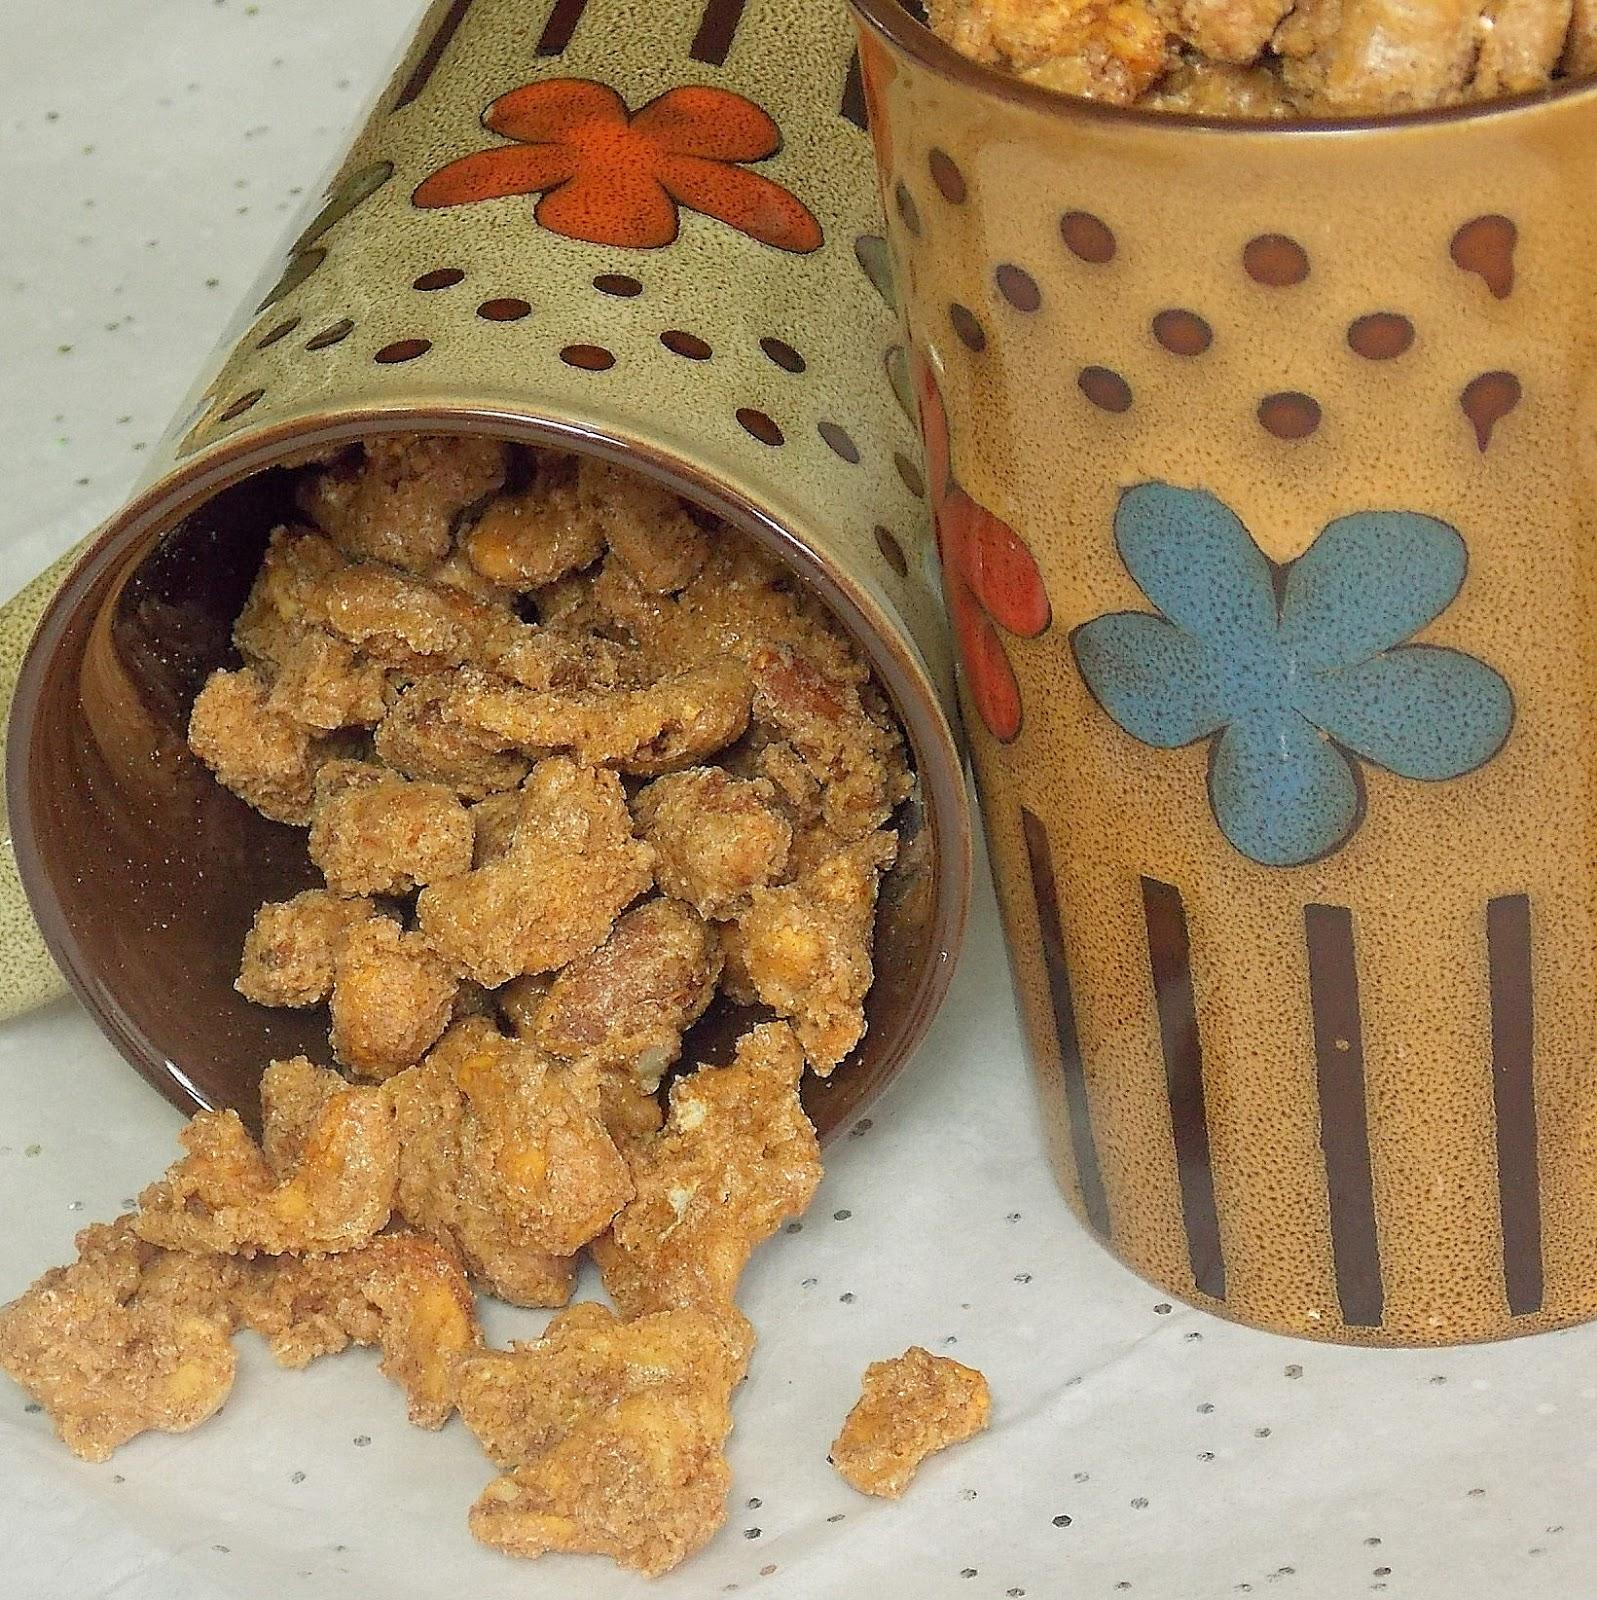 Cinnamon Roasted Nuts - Grumpy's Honey Bunch